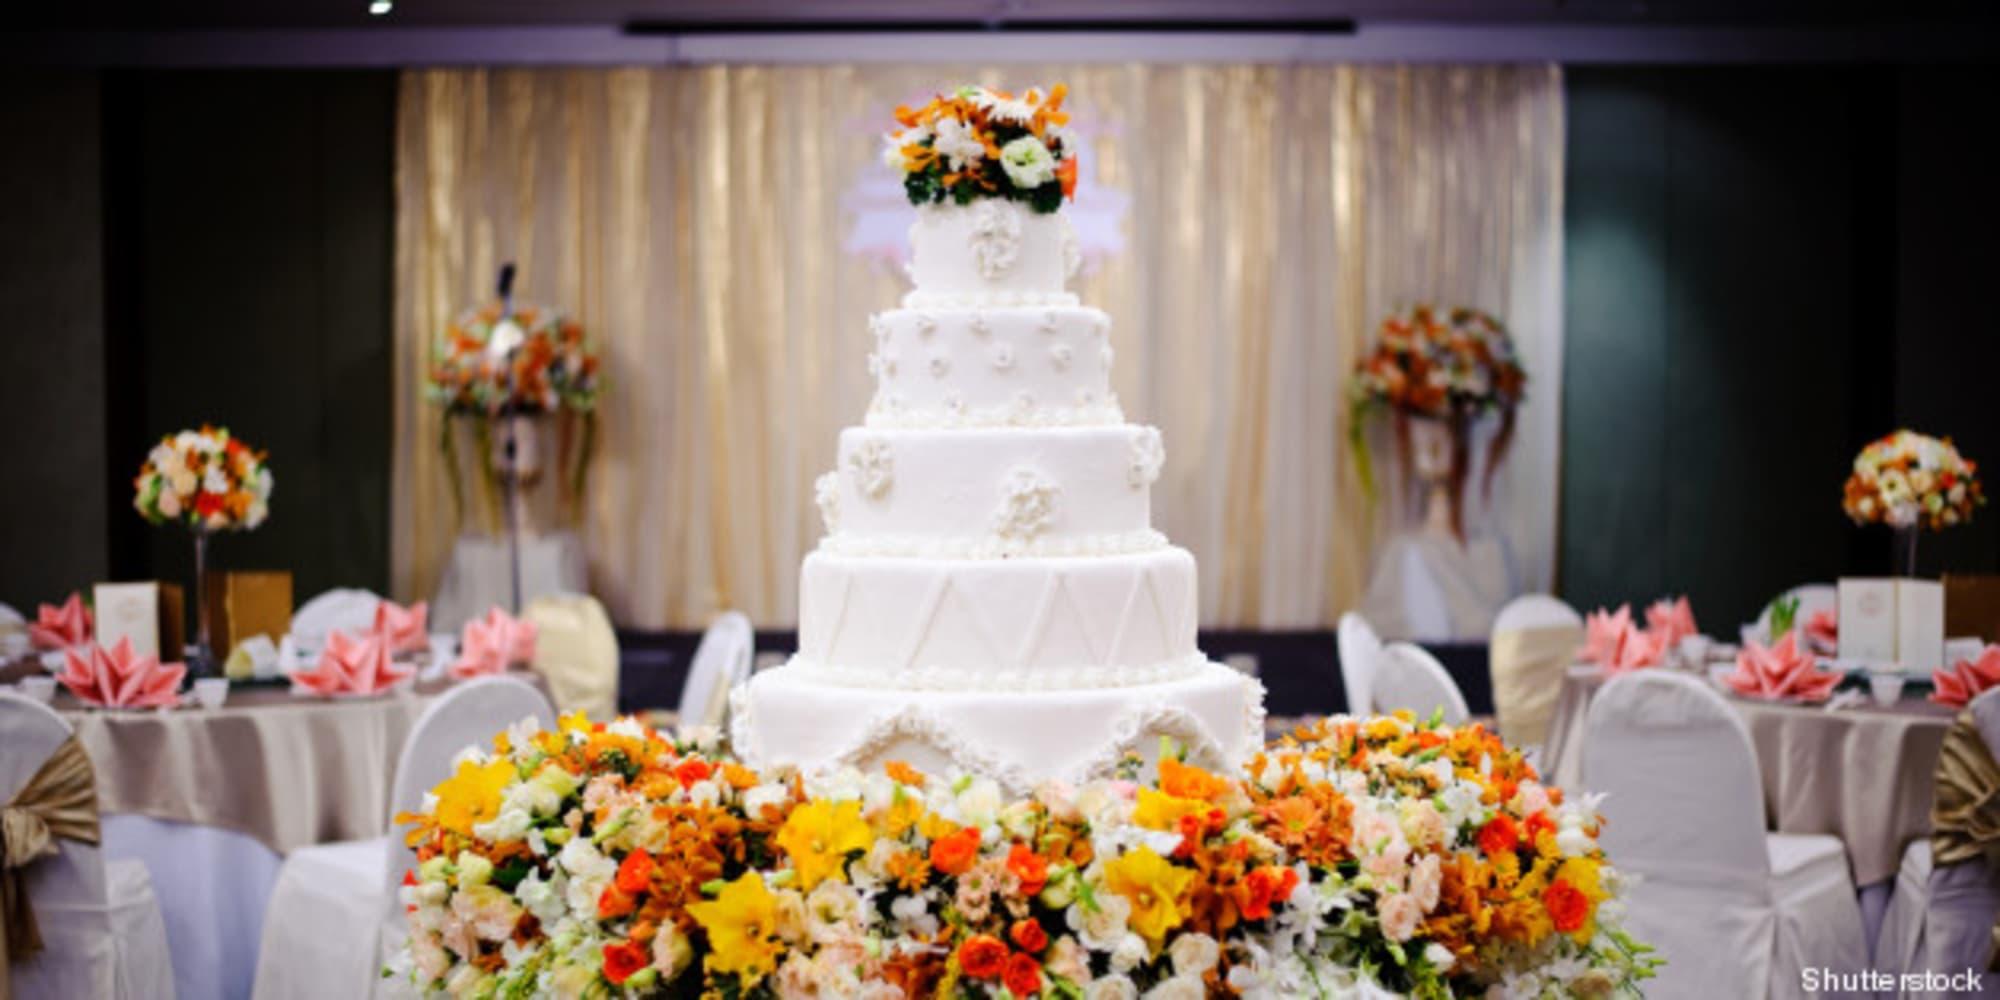 cadeau de mariage lodieuse carte de remerciement dune jeune marie - Remerciement Mariage Personne Absente